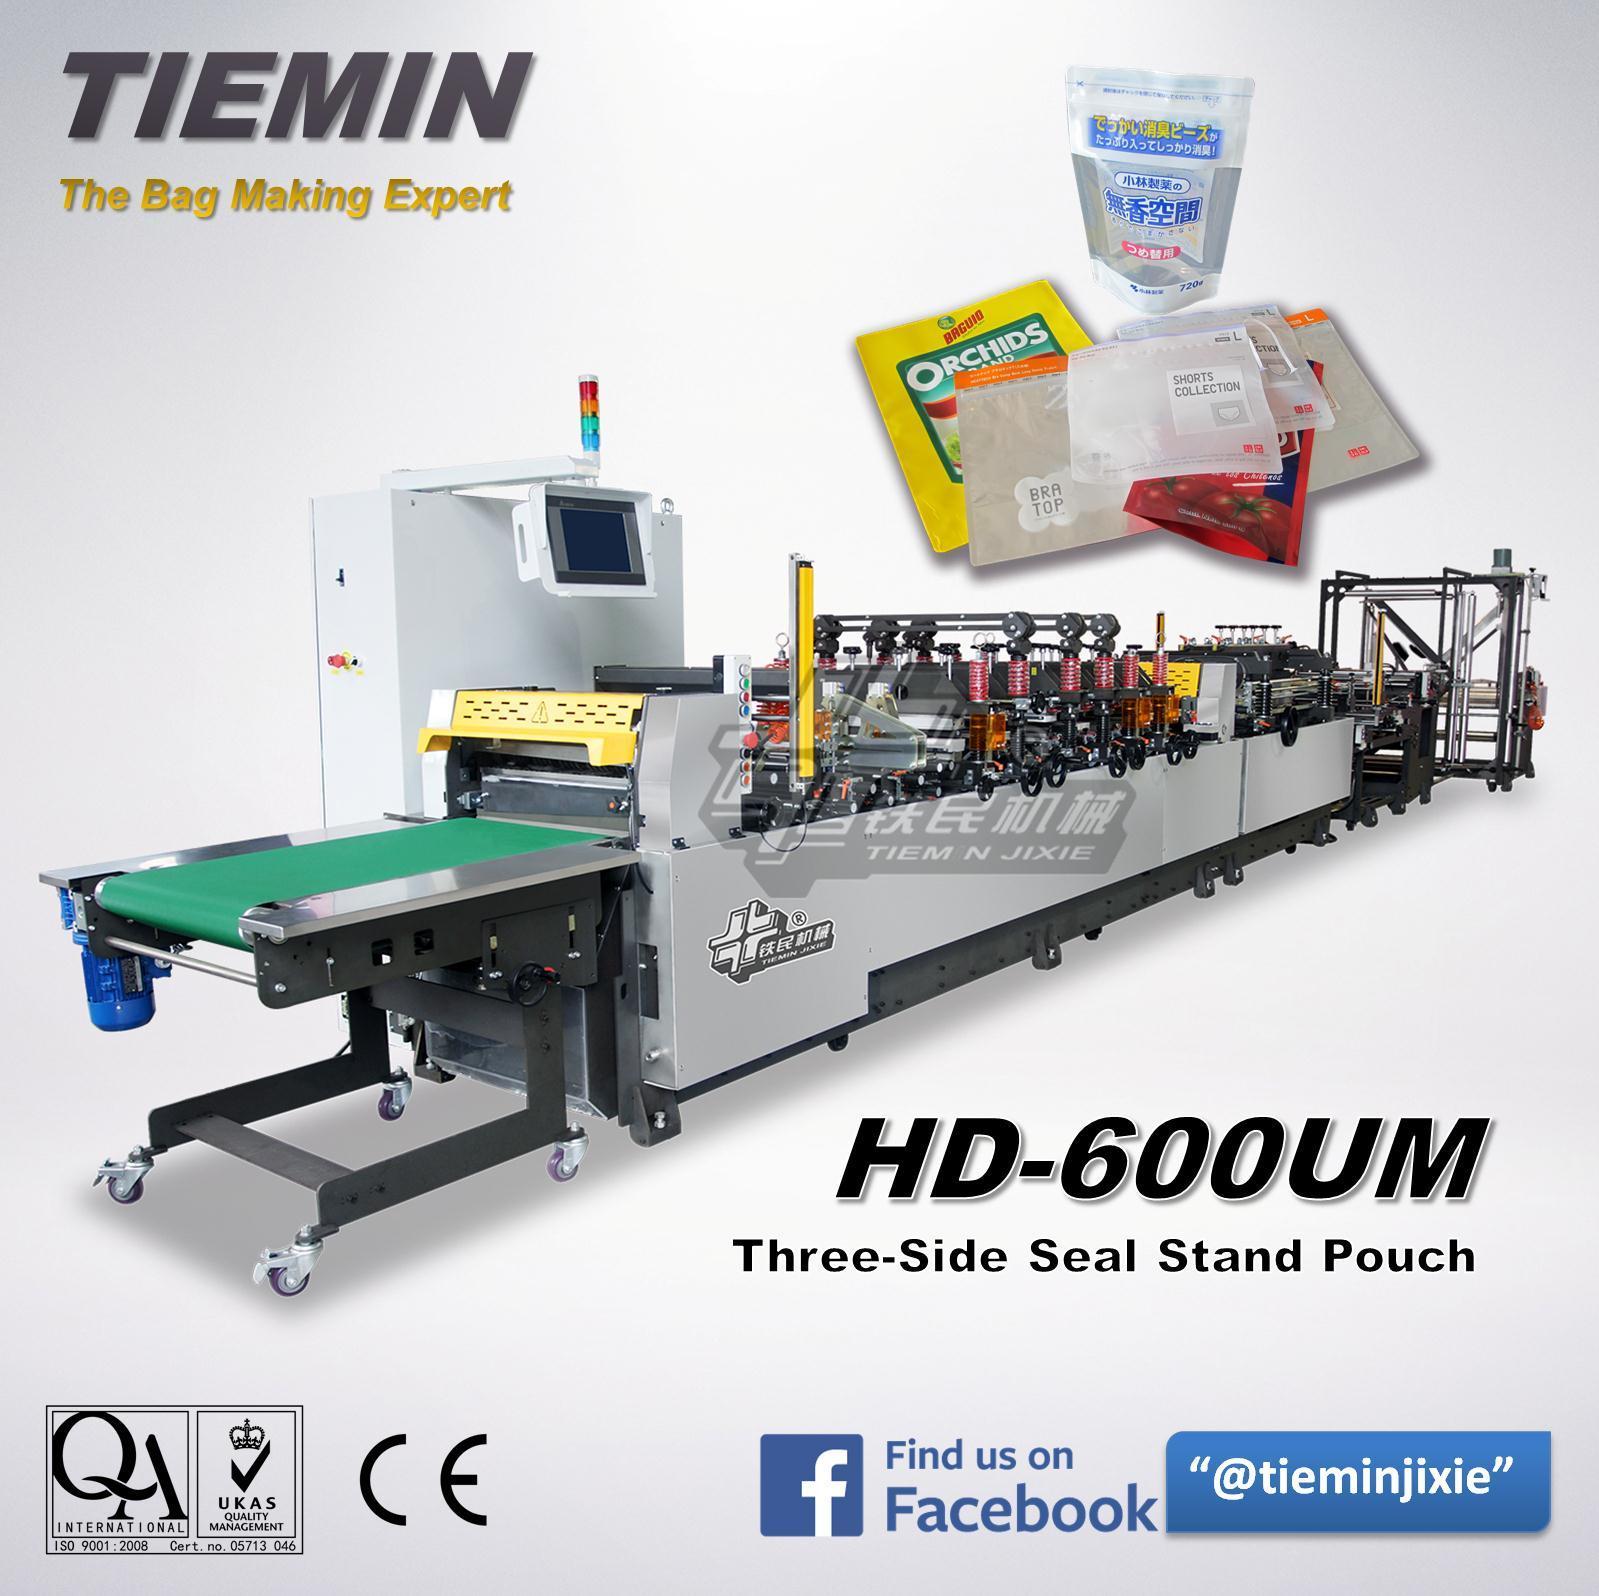 Tiemin High Quality High Speed Automatic Three-Side Bag Making Machine Bag Machine HD-600um